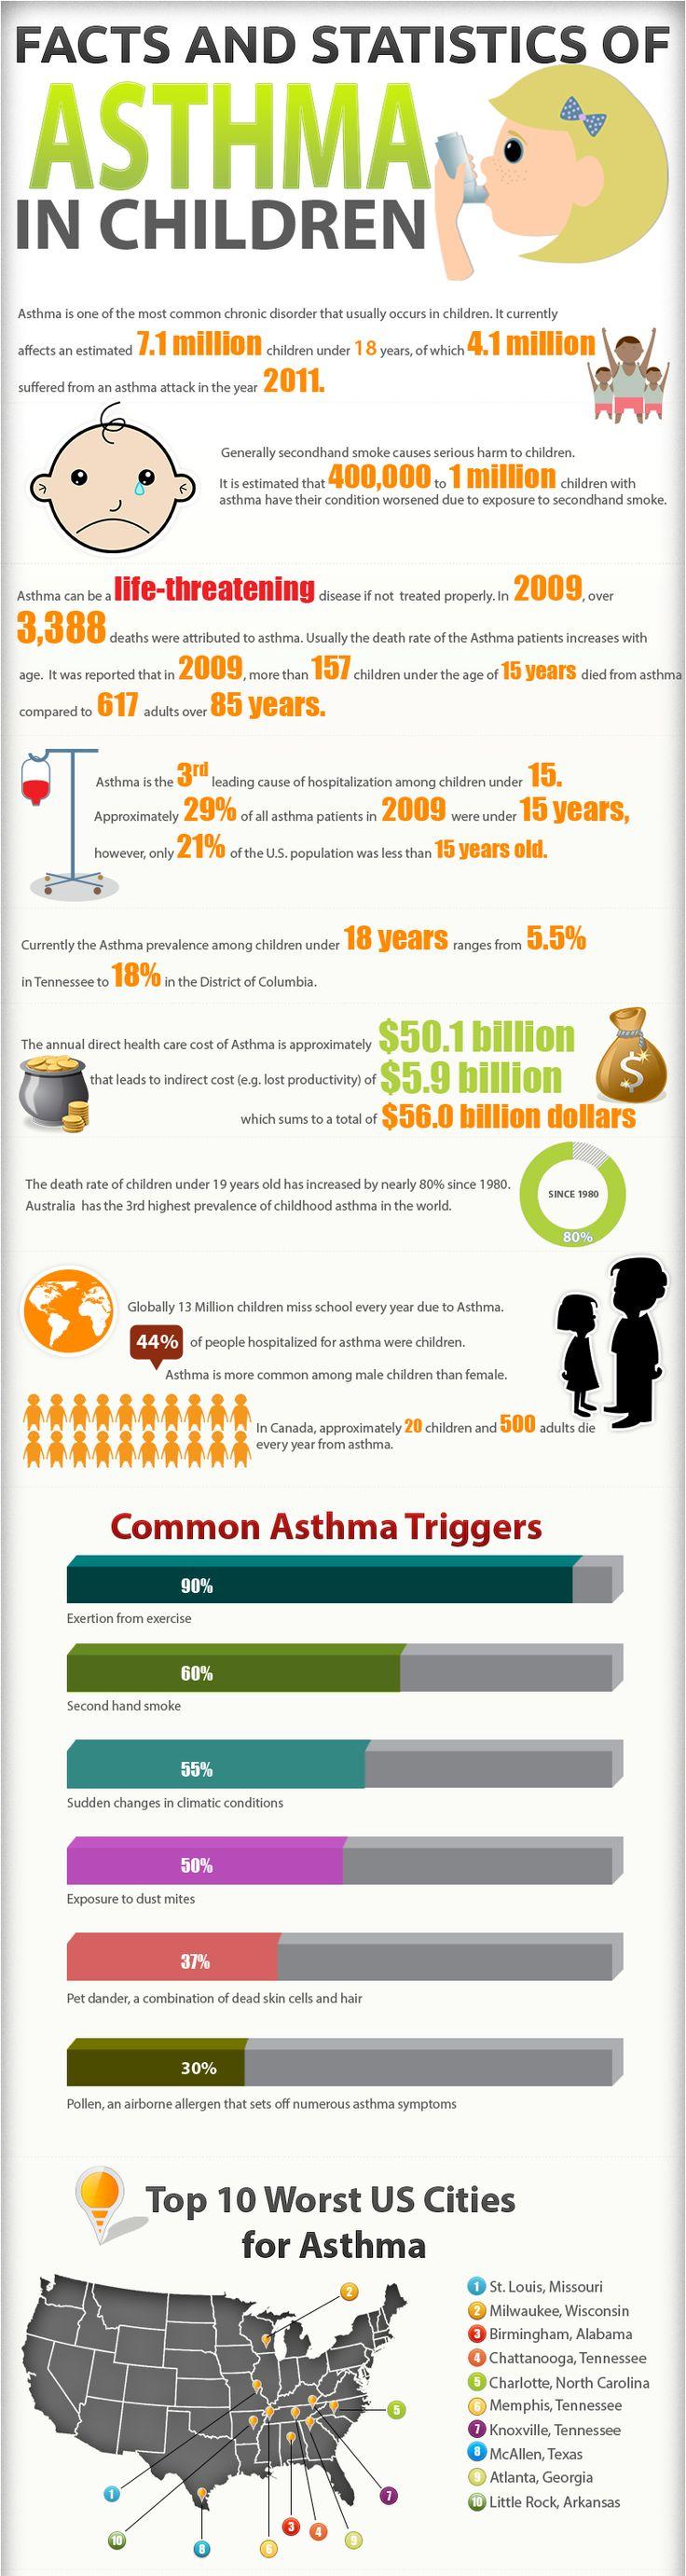 Racepinephrine pediatric dosage for azithromycin